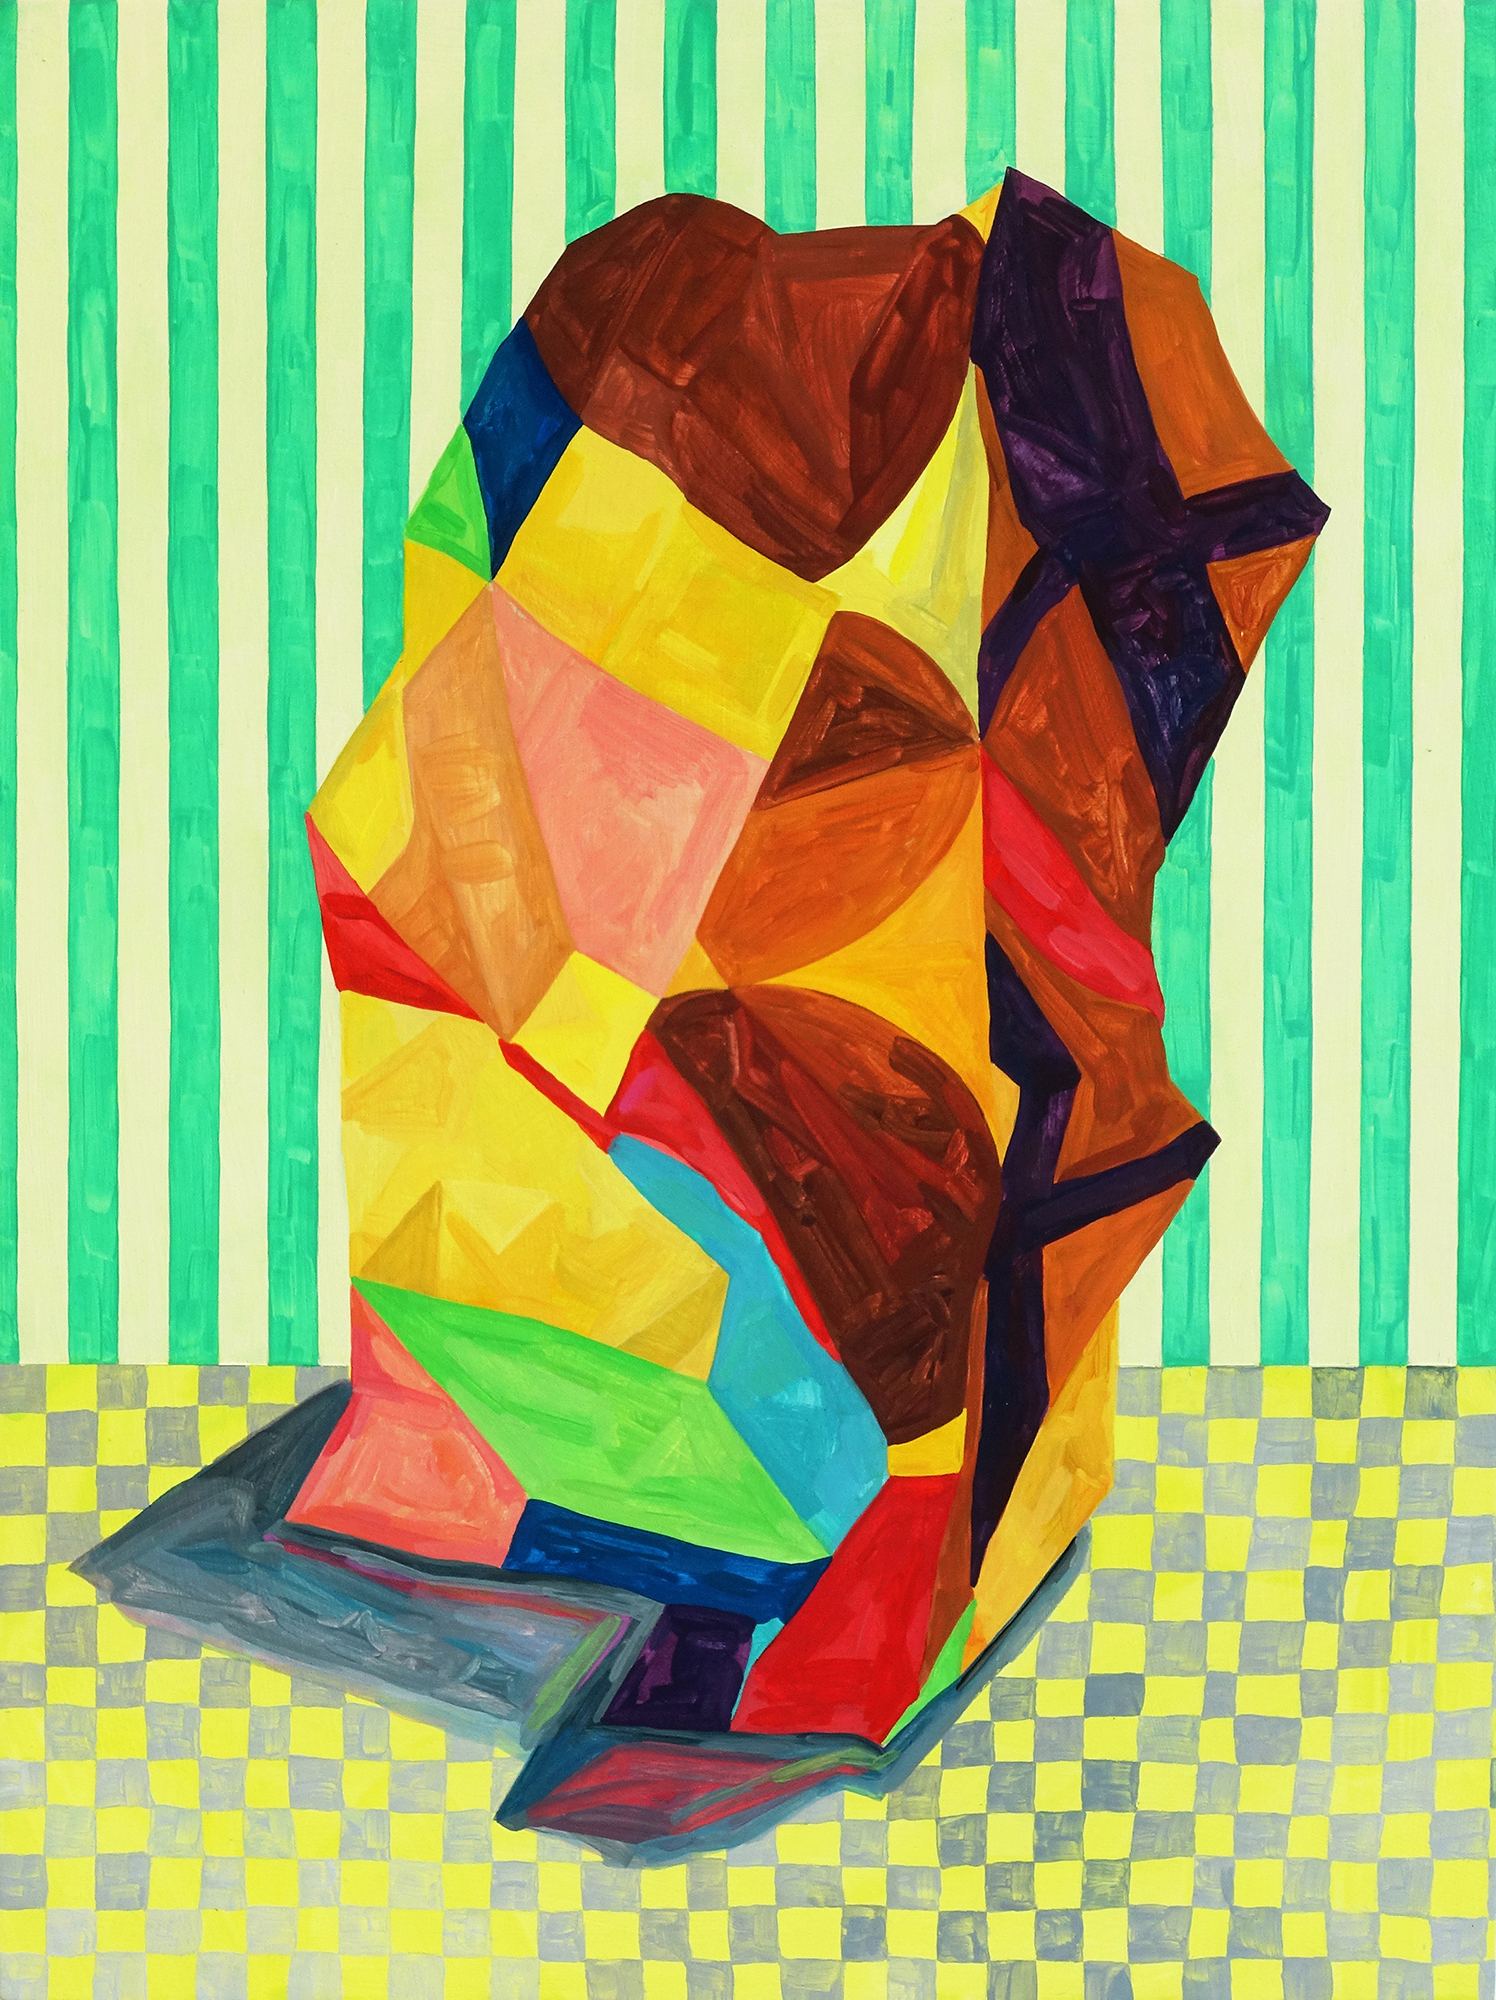 Louisa Chambers, Lean, gouache on board, 40 x 30 x 2,  http://www.louisachambers.com